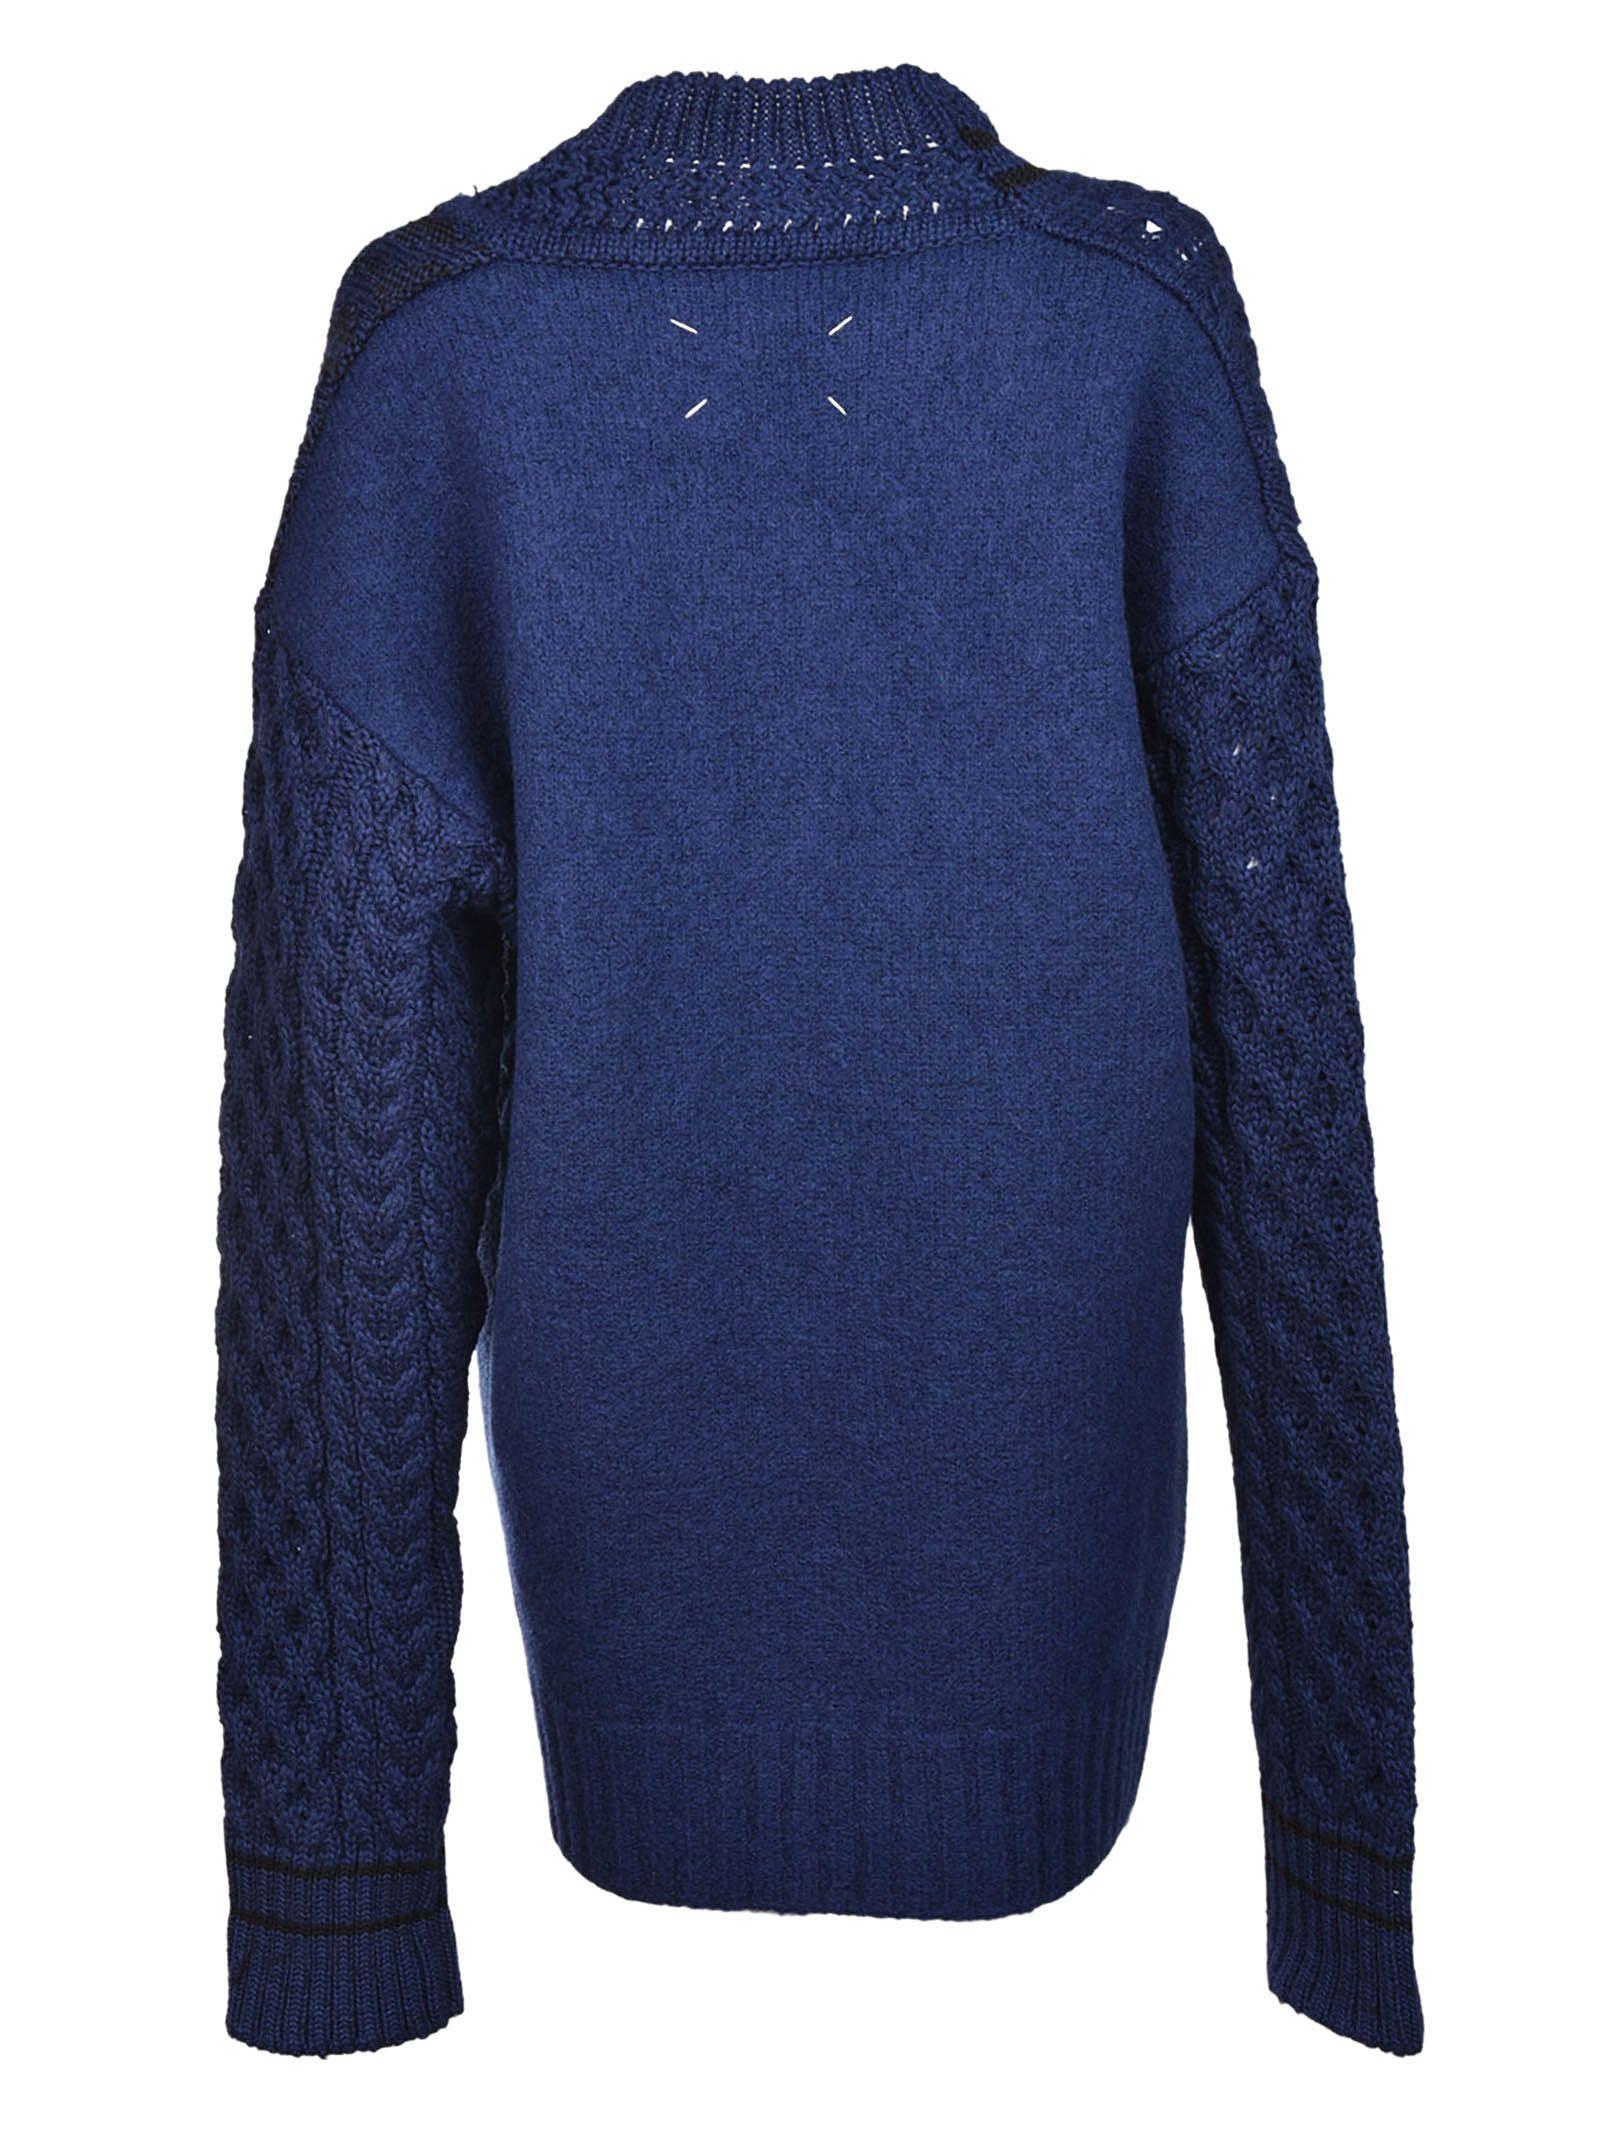 Maison Margiela - Maison Margiela Asymmetric Cable Knit Sweater ...